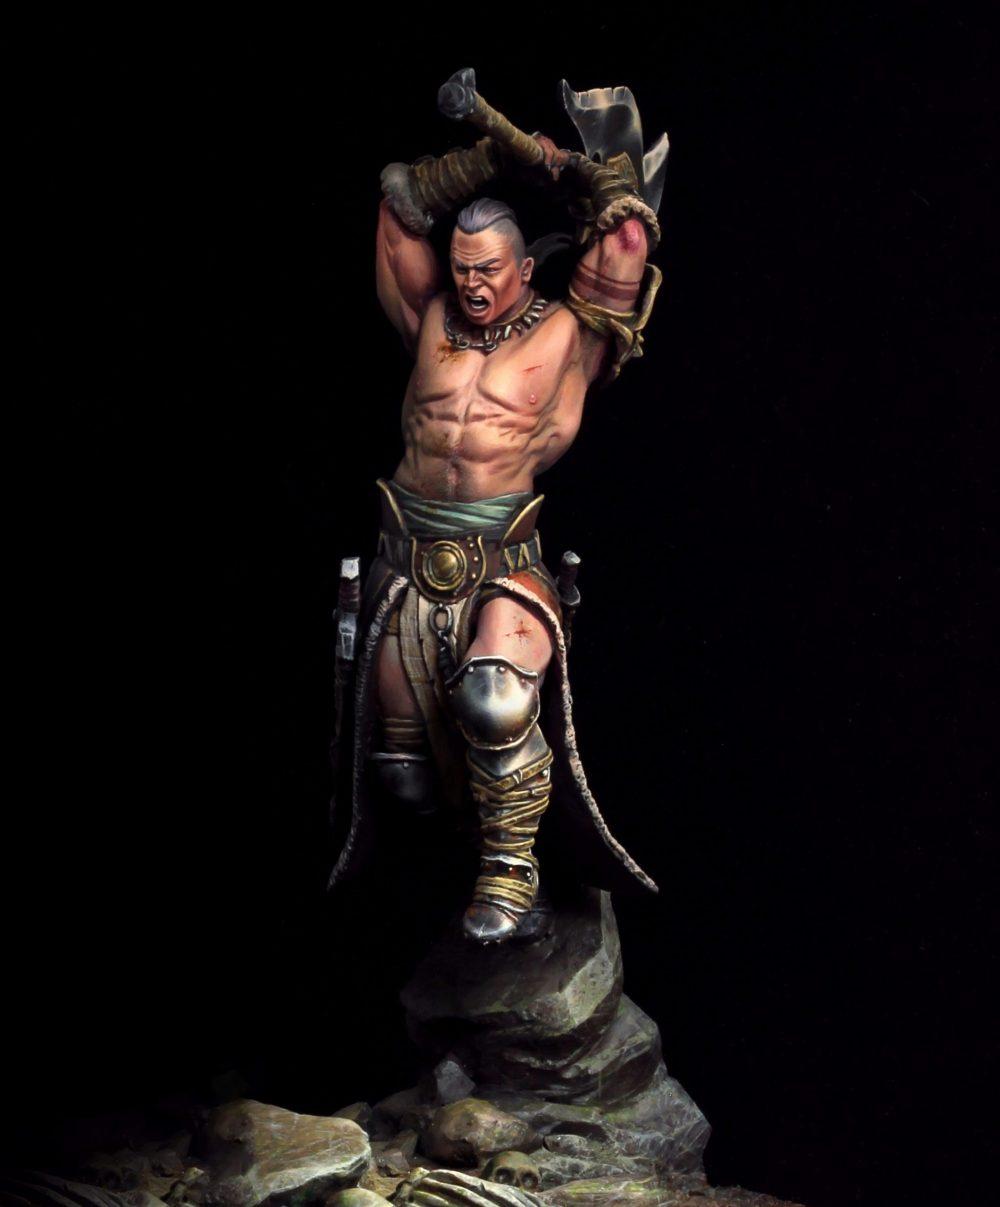 [Image: Solrak-Barbarian-Fury-scaled-e1579892018498.jpg]